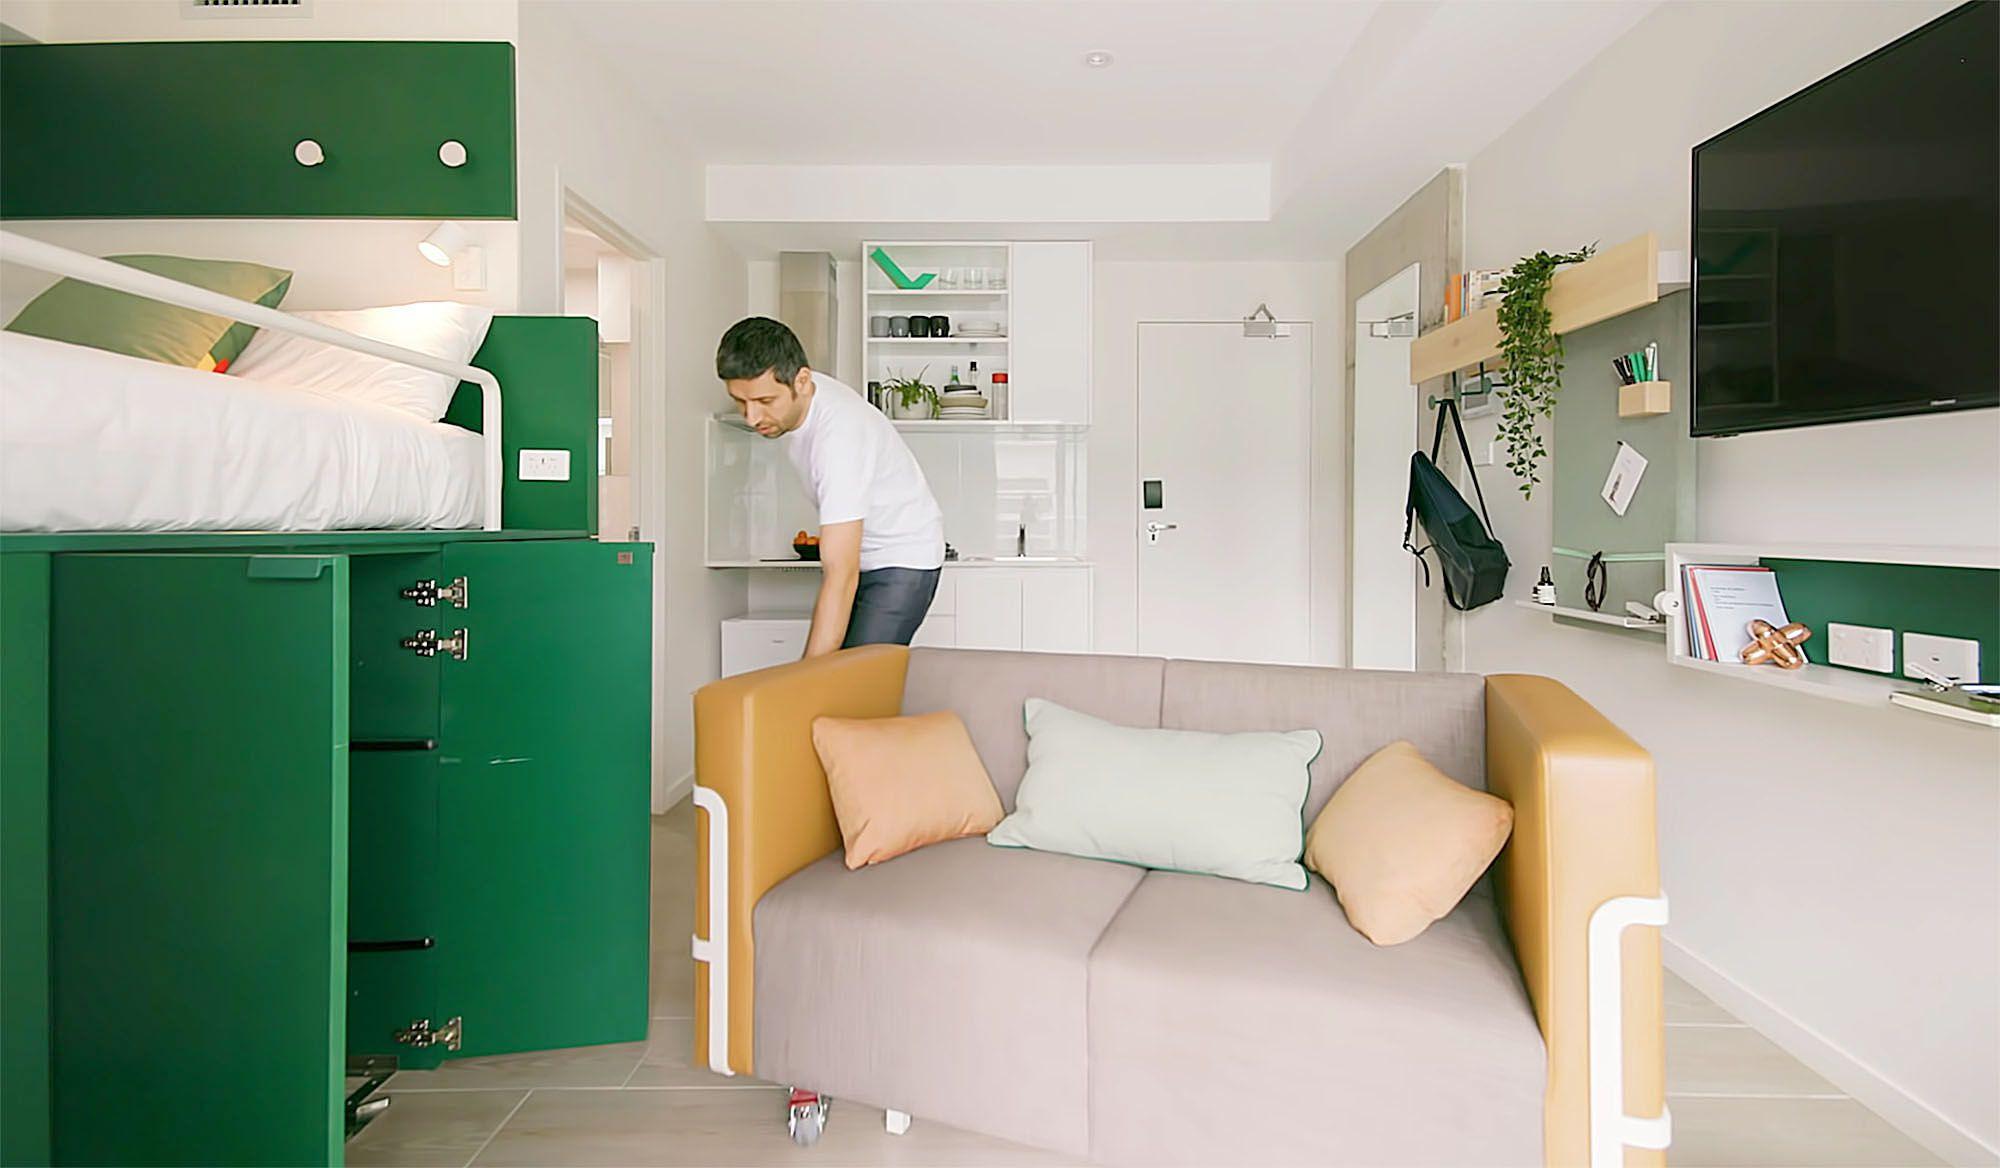 UKO stanmore coliving micro-apartment Mostaghim Associates sofa